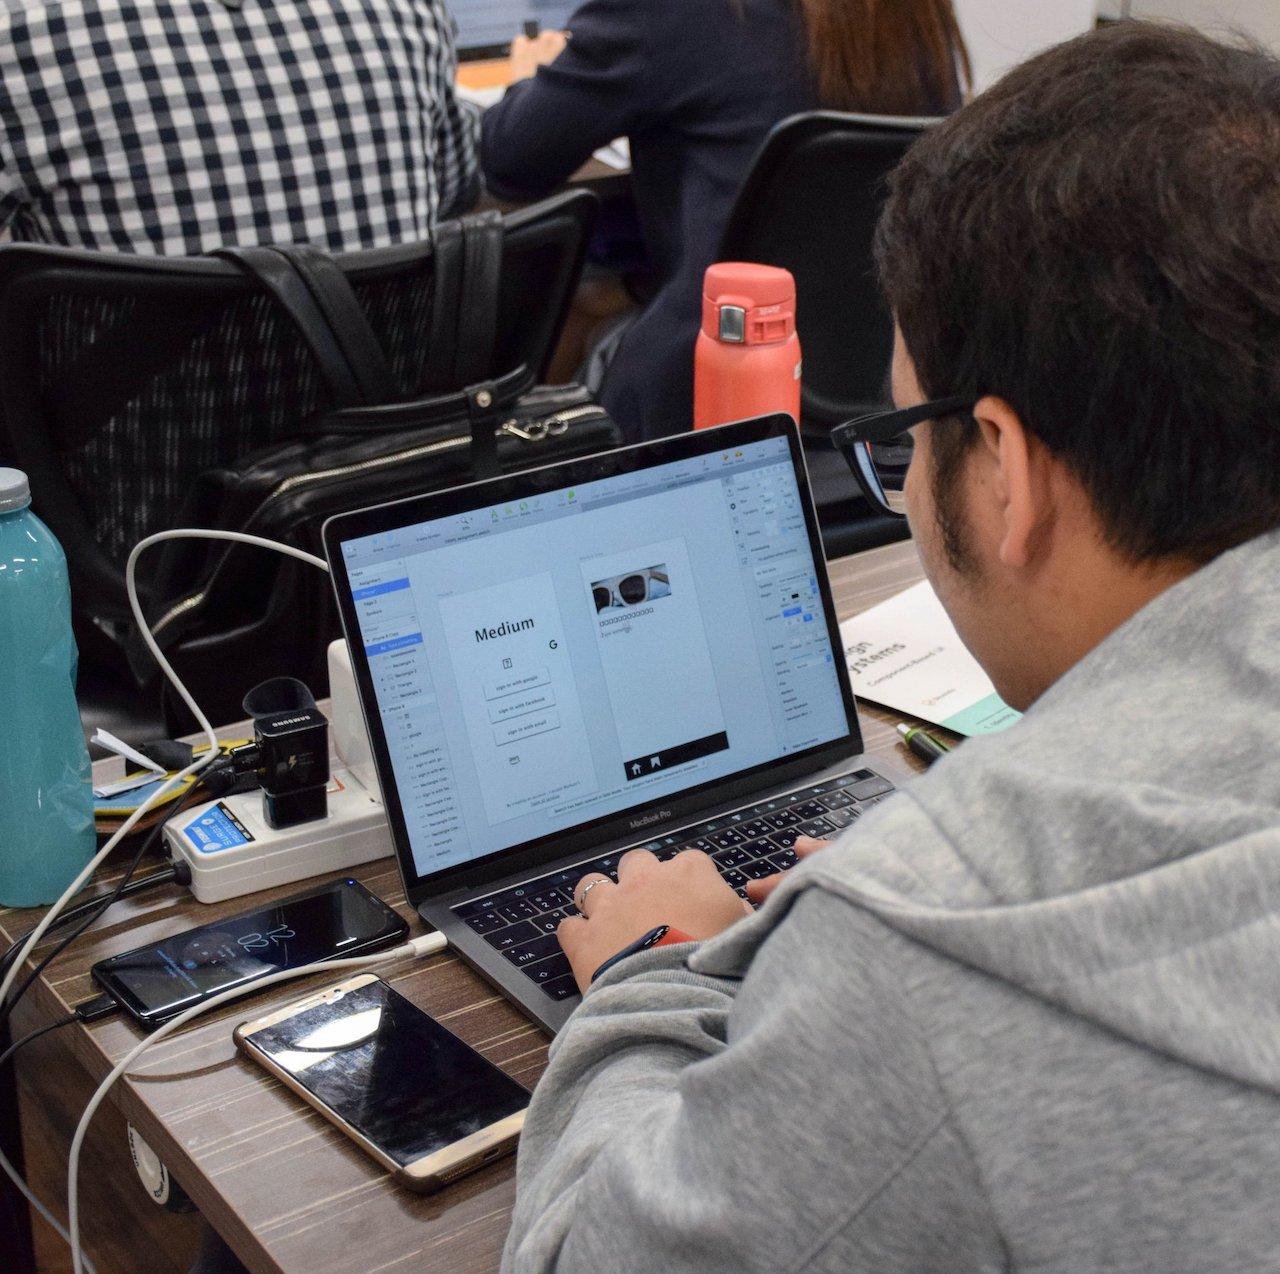 Skooldio Workshop: Design Systems with Sketch